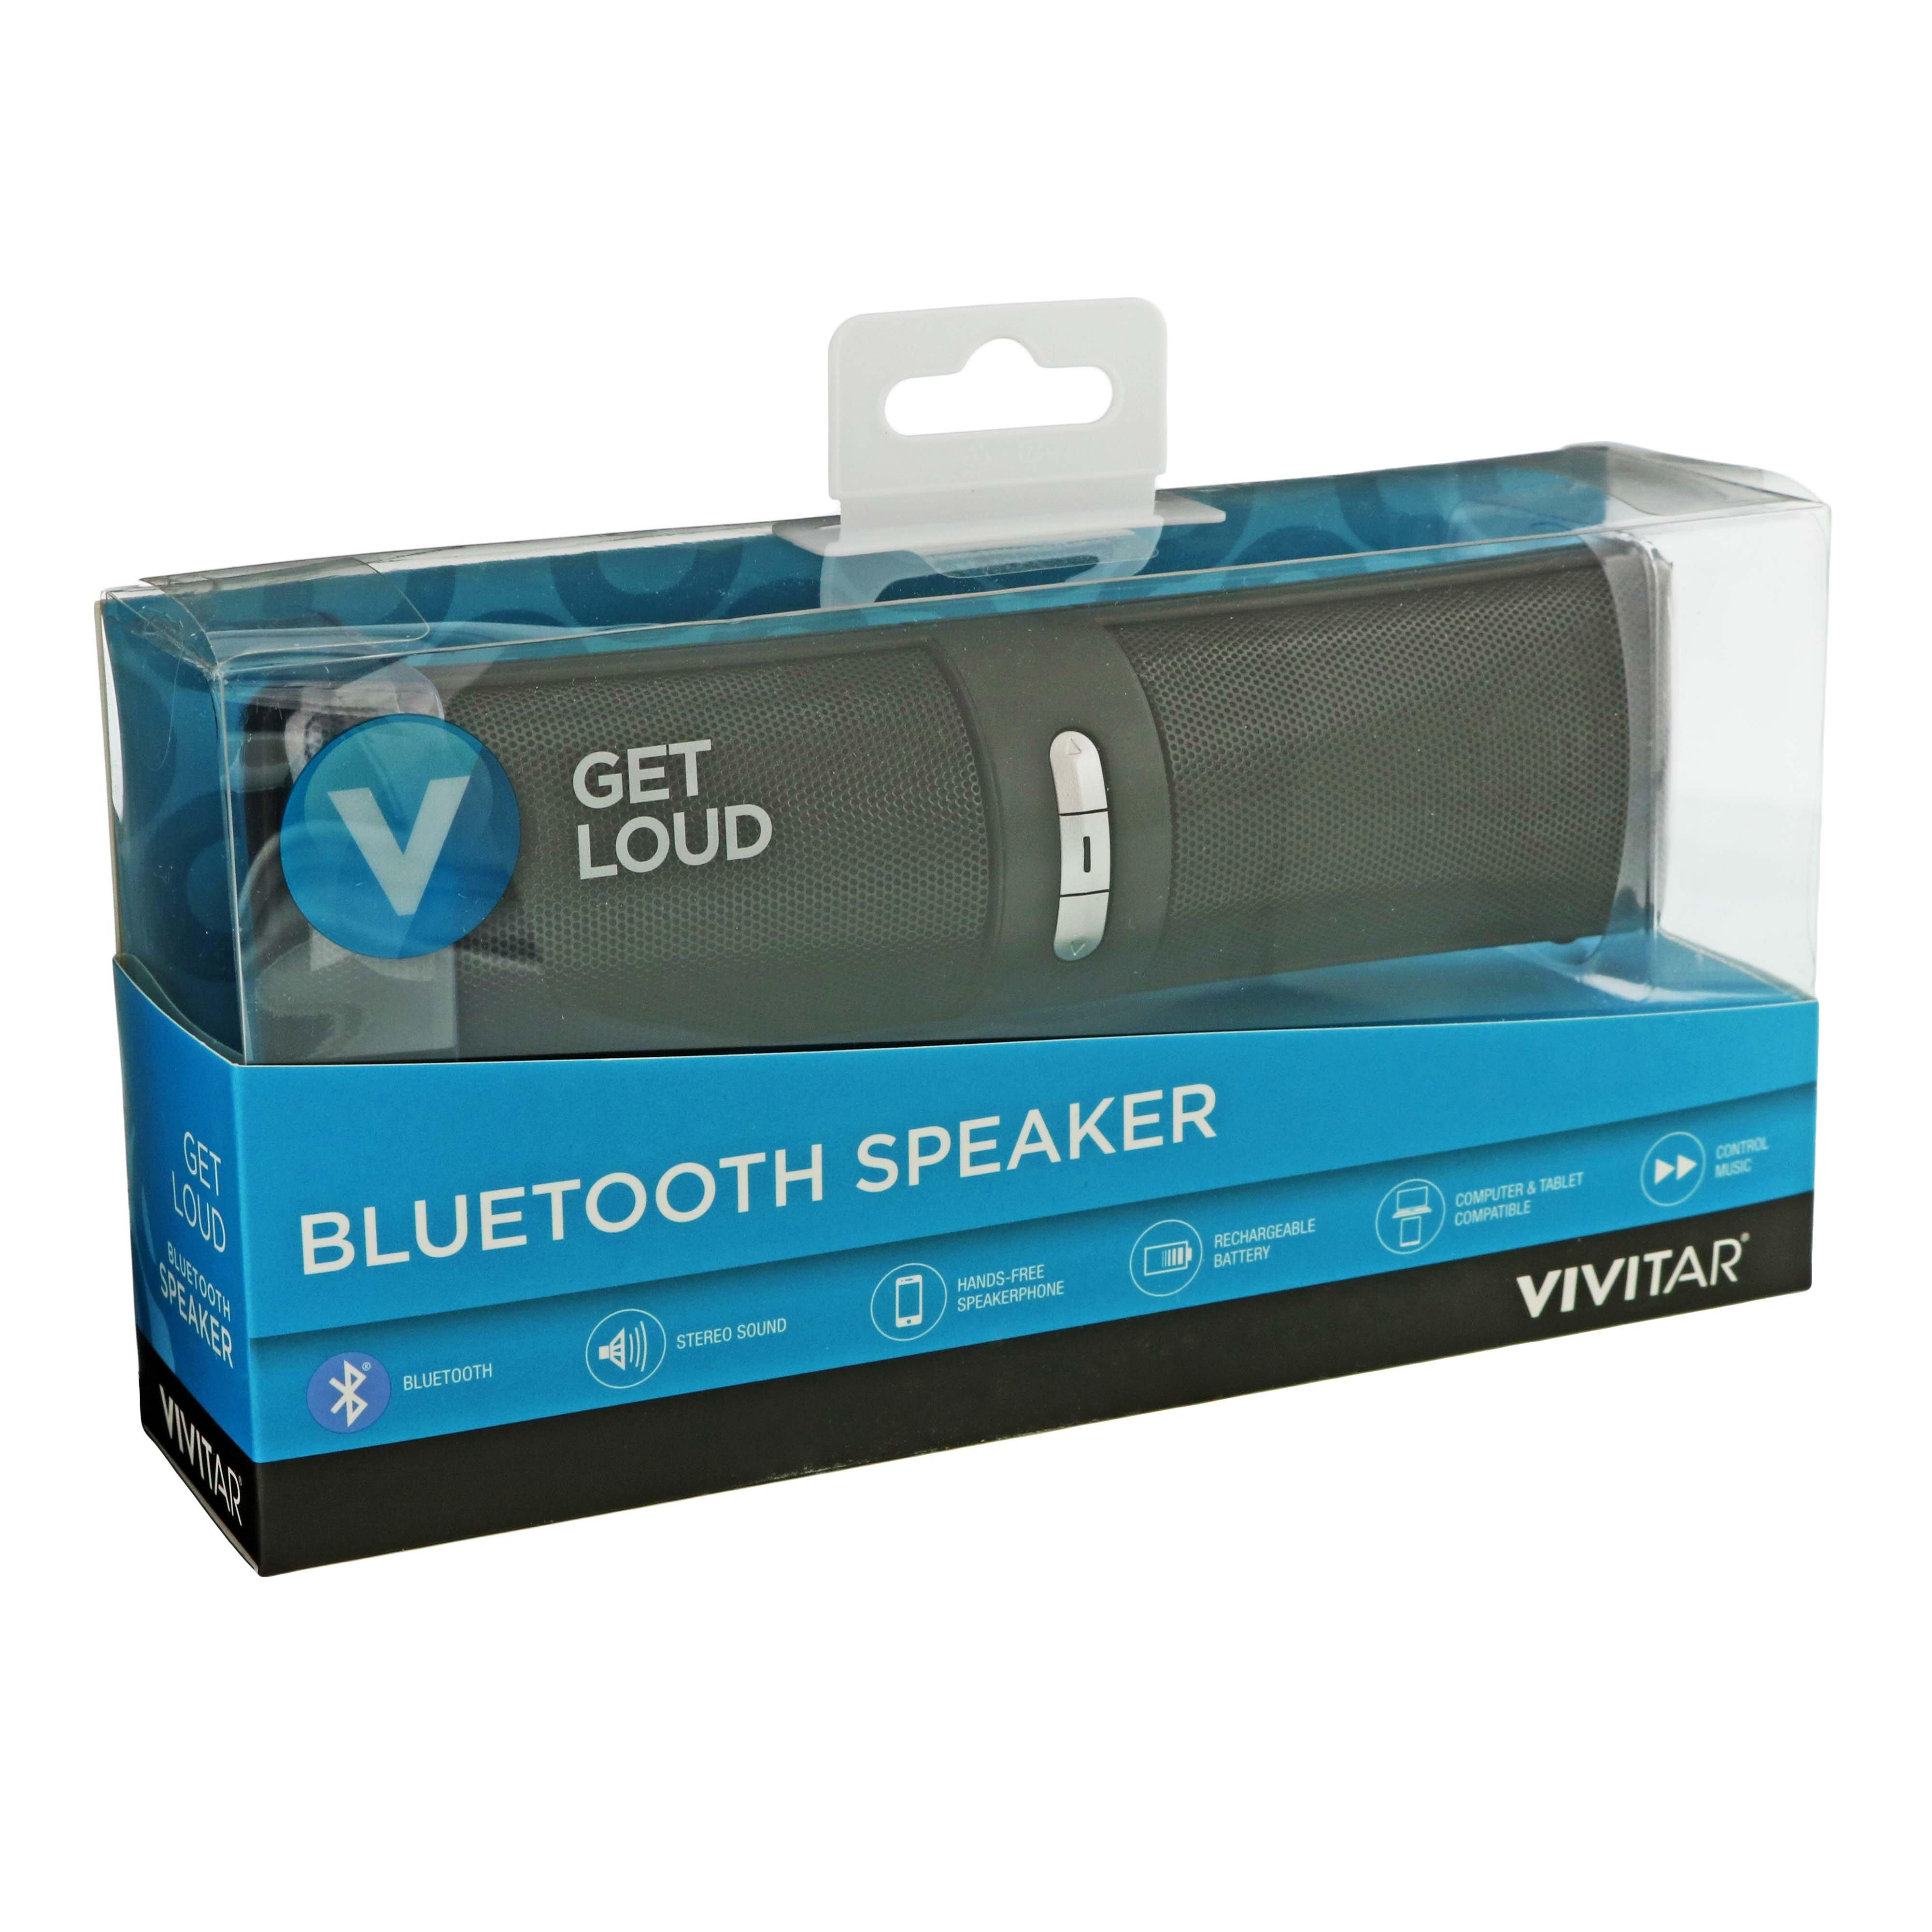 Vivitar Mobile Candy Bluetooth Speaker ‑ Shop Audio at H‑E‑B